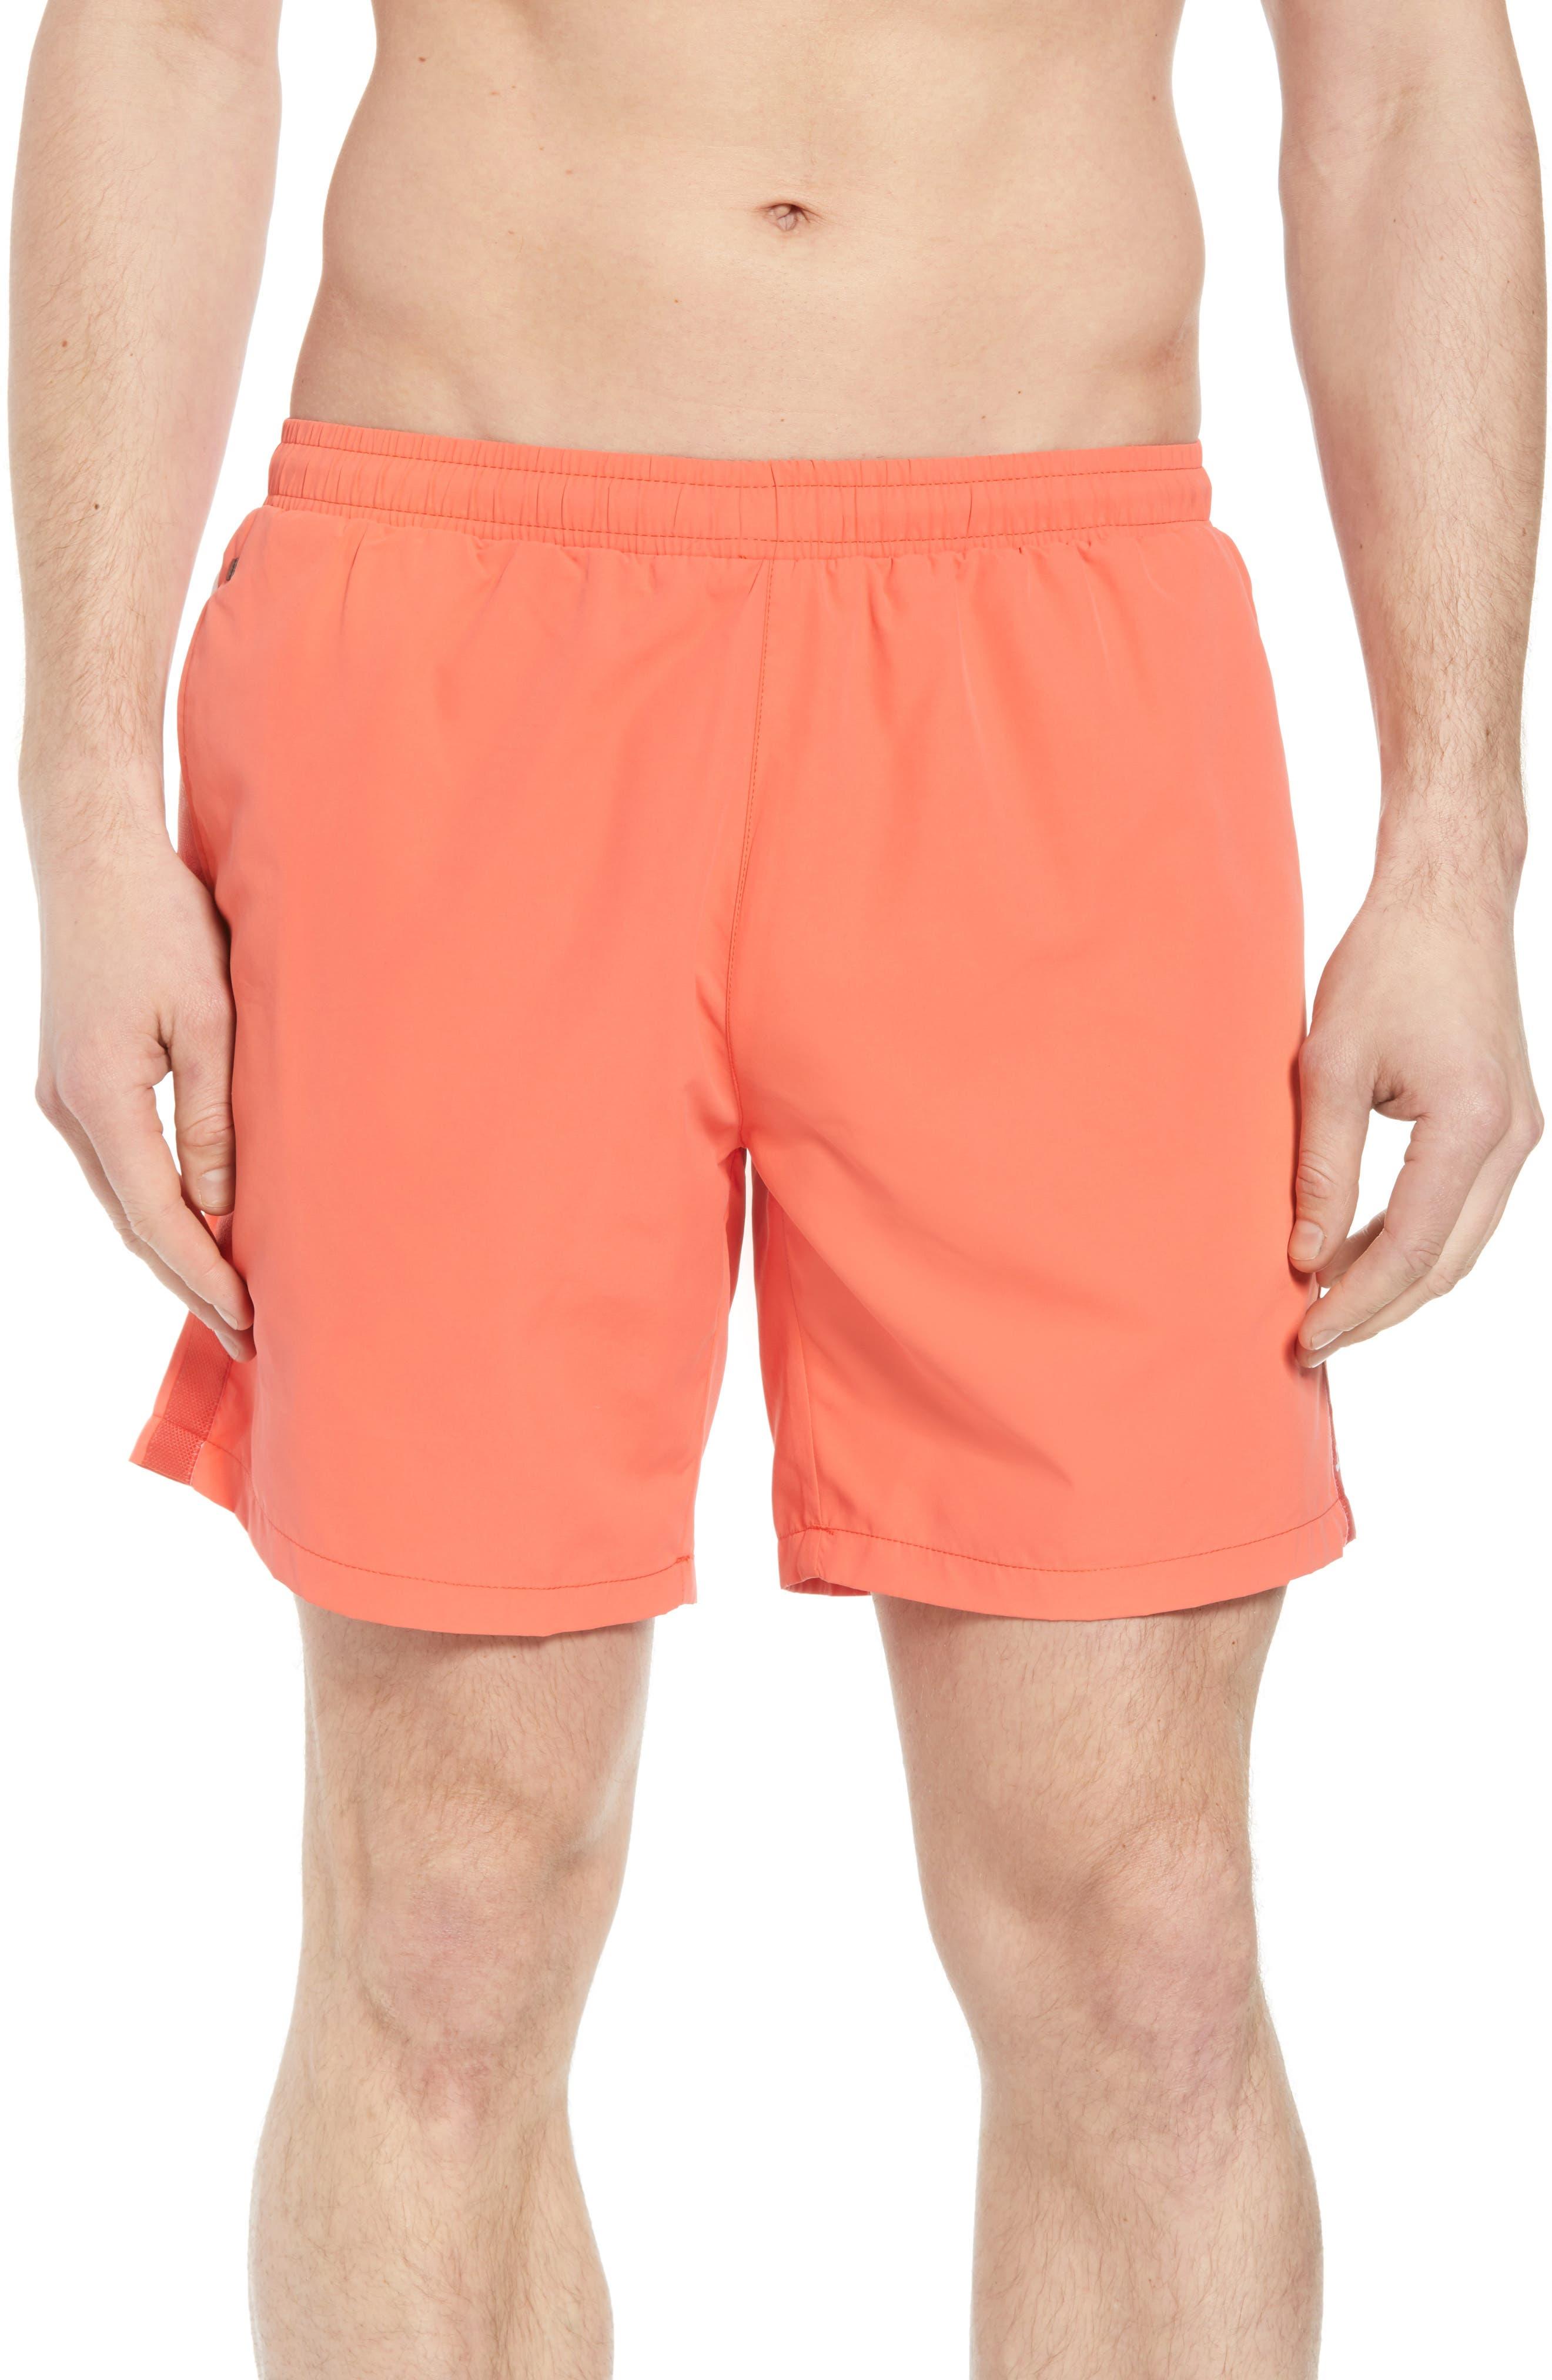 Seabream Regular Fit Stripe Swim Trunks,                         Main,                         color, 633